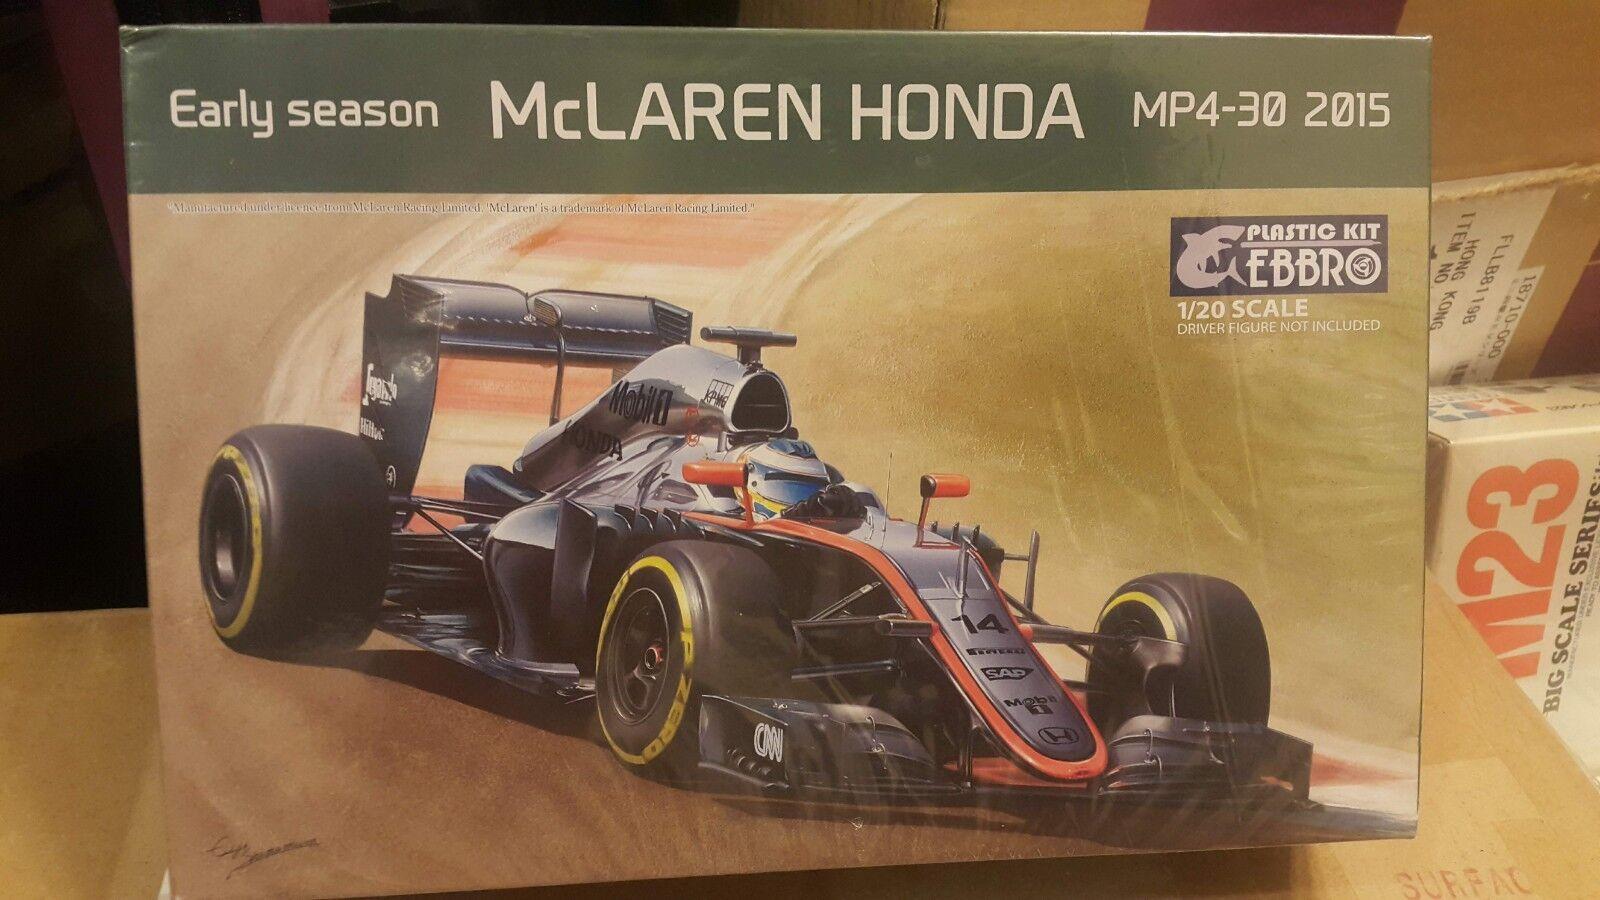 Ebbro 1 20 Mclaren Honda MP4-30 2015 Early Season F1 Model Car Kit